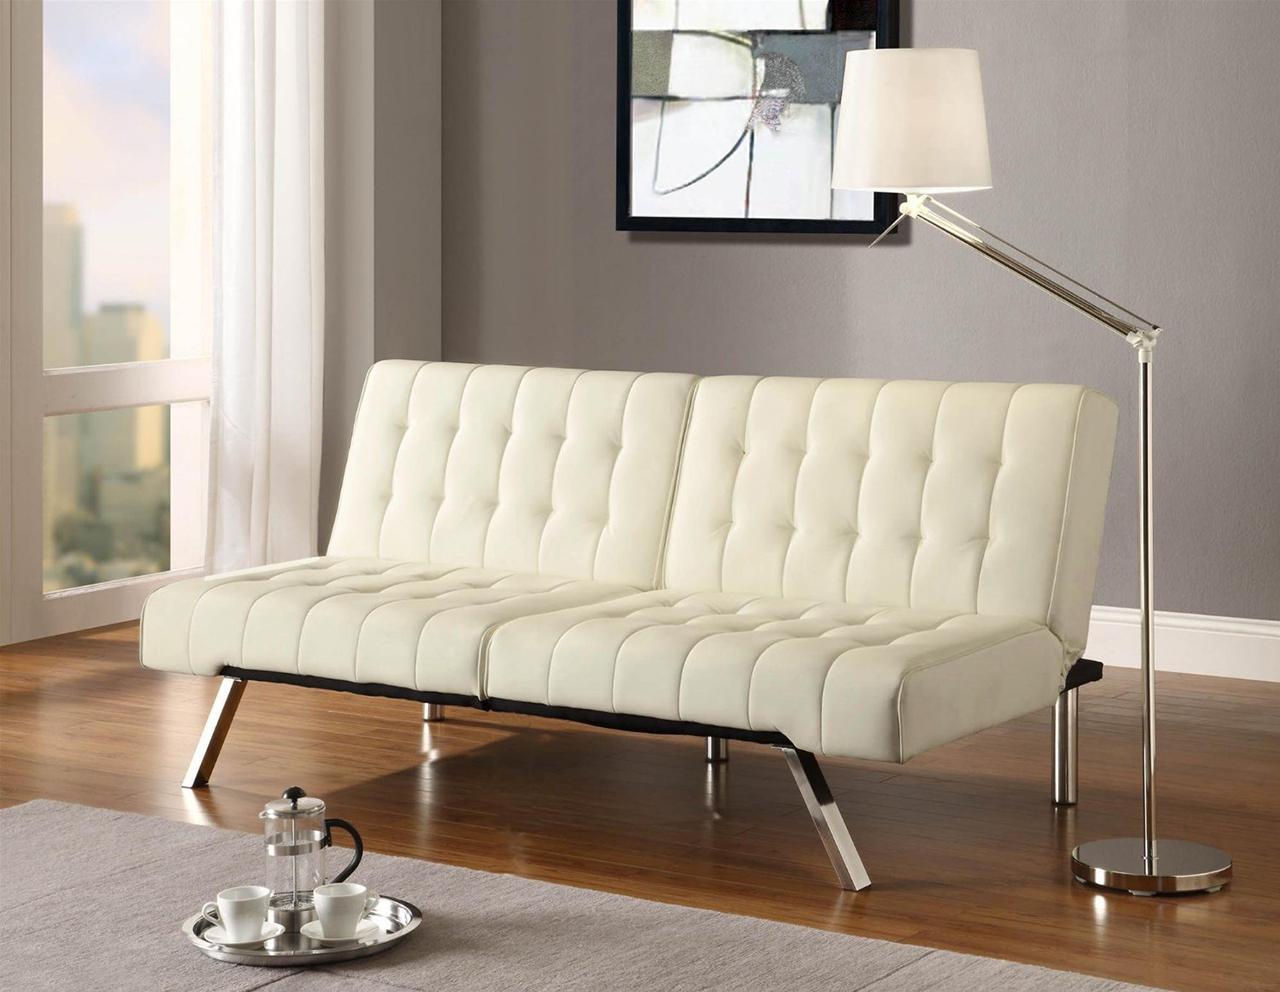 DHM Convertible Sofa in Vanilla